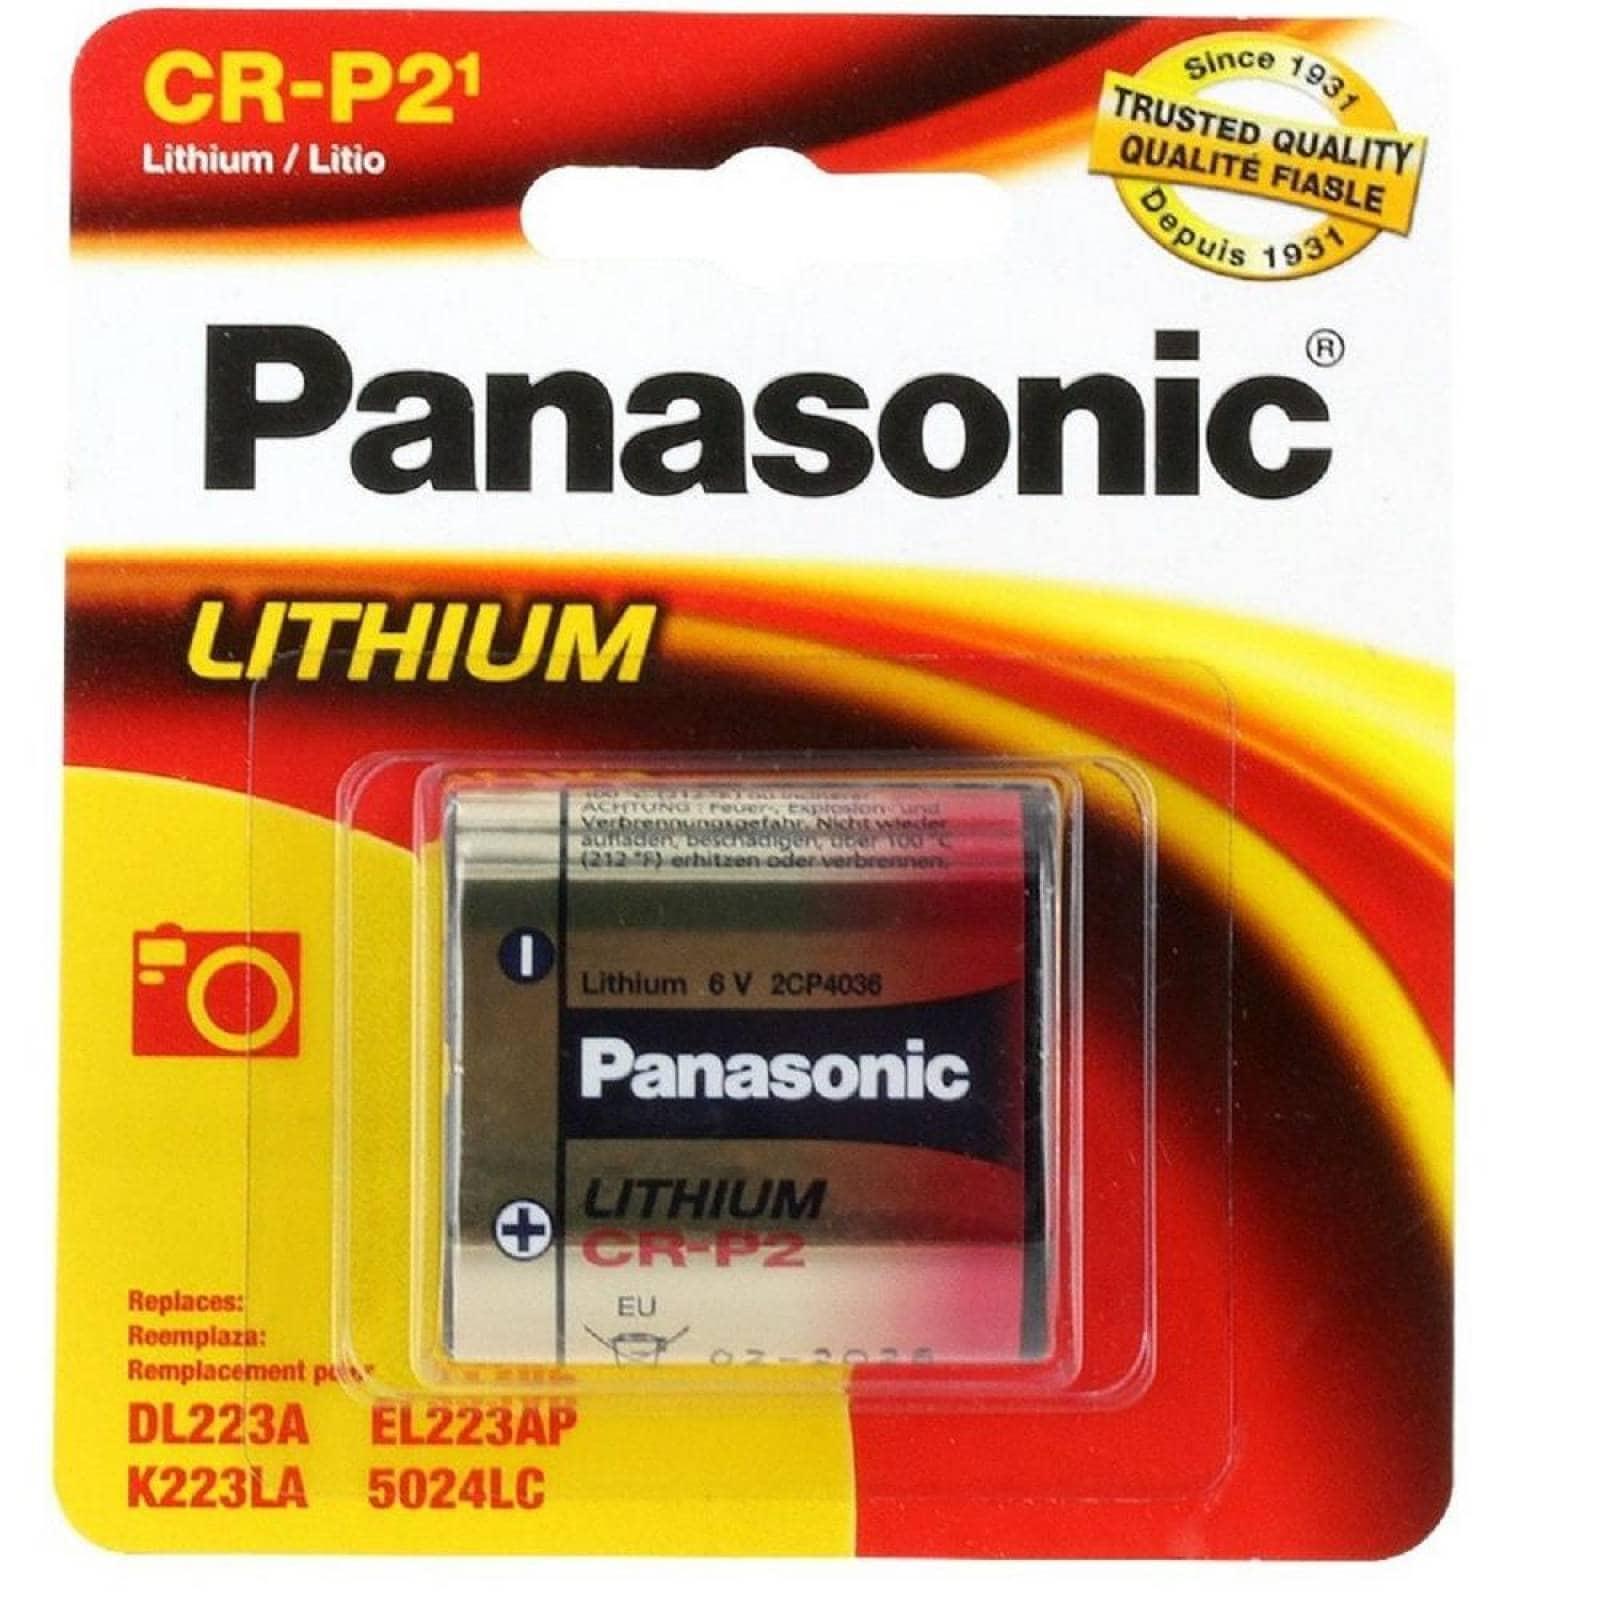 PILA PANASONIC LITIO CRP2 6V CR-P2PA1B